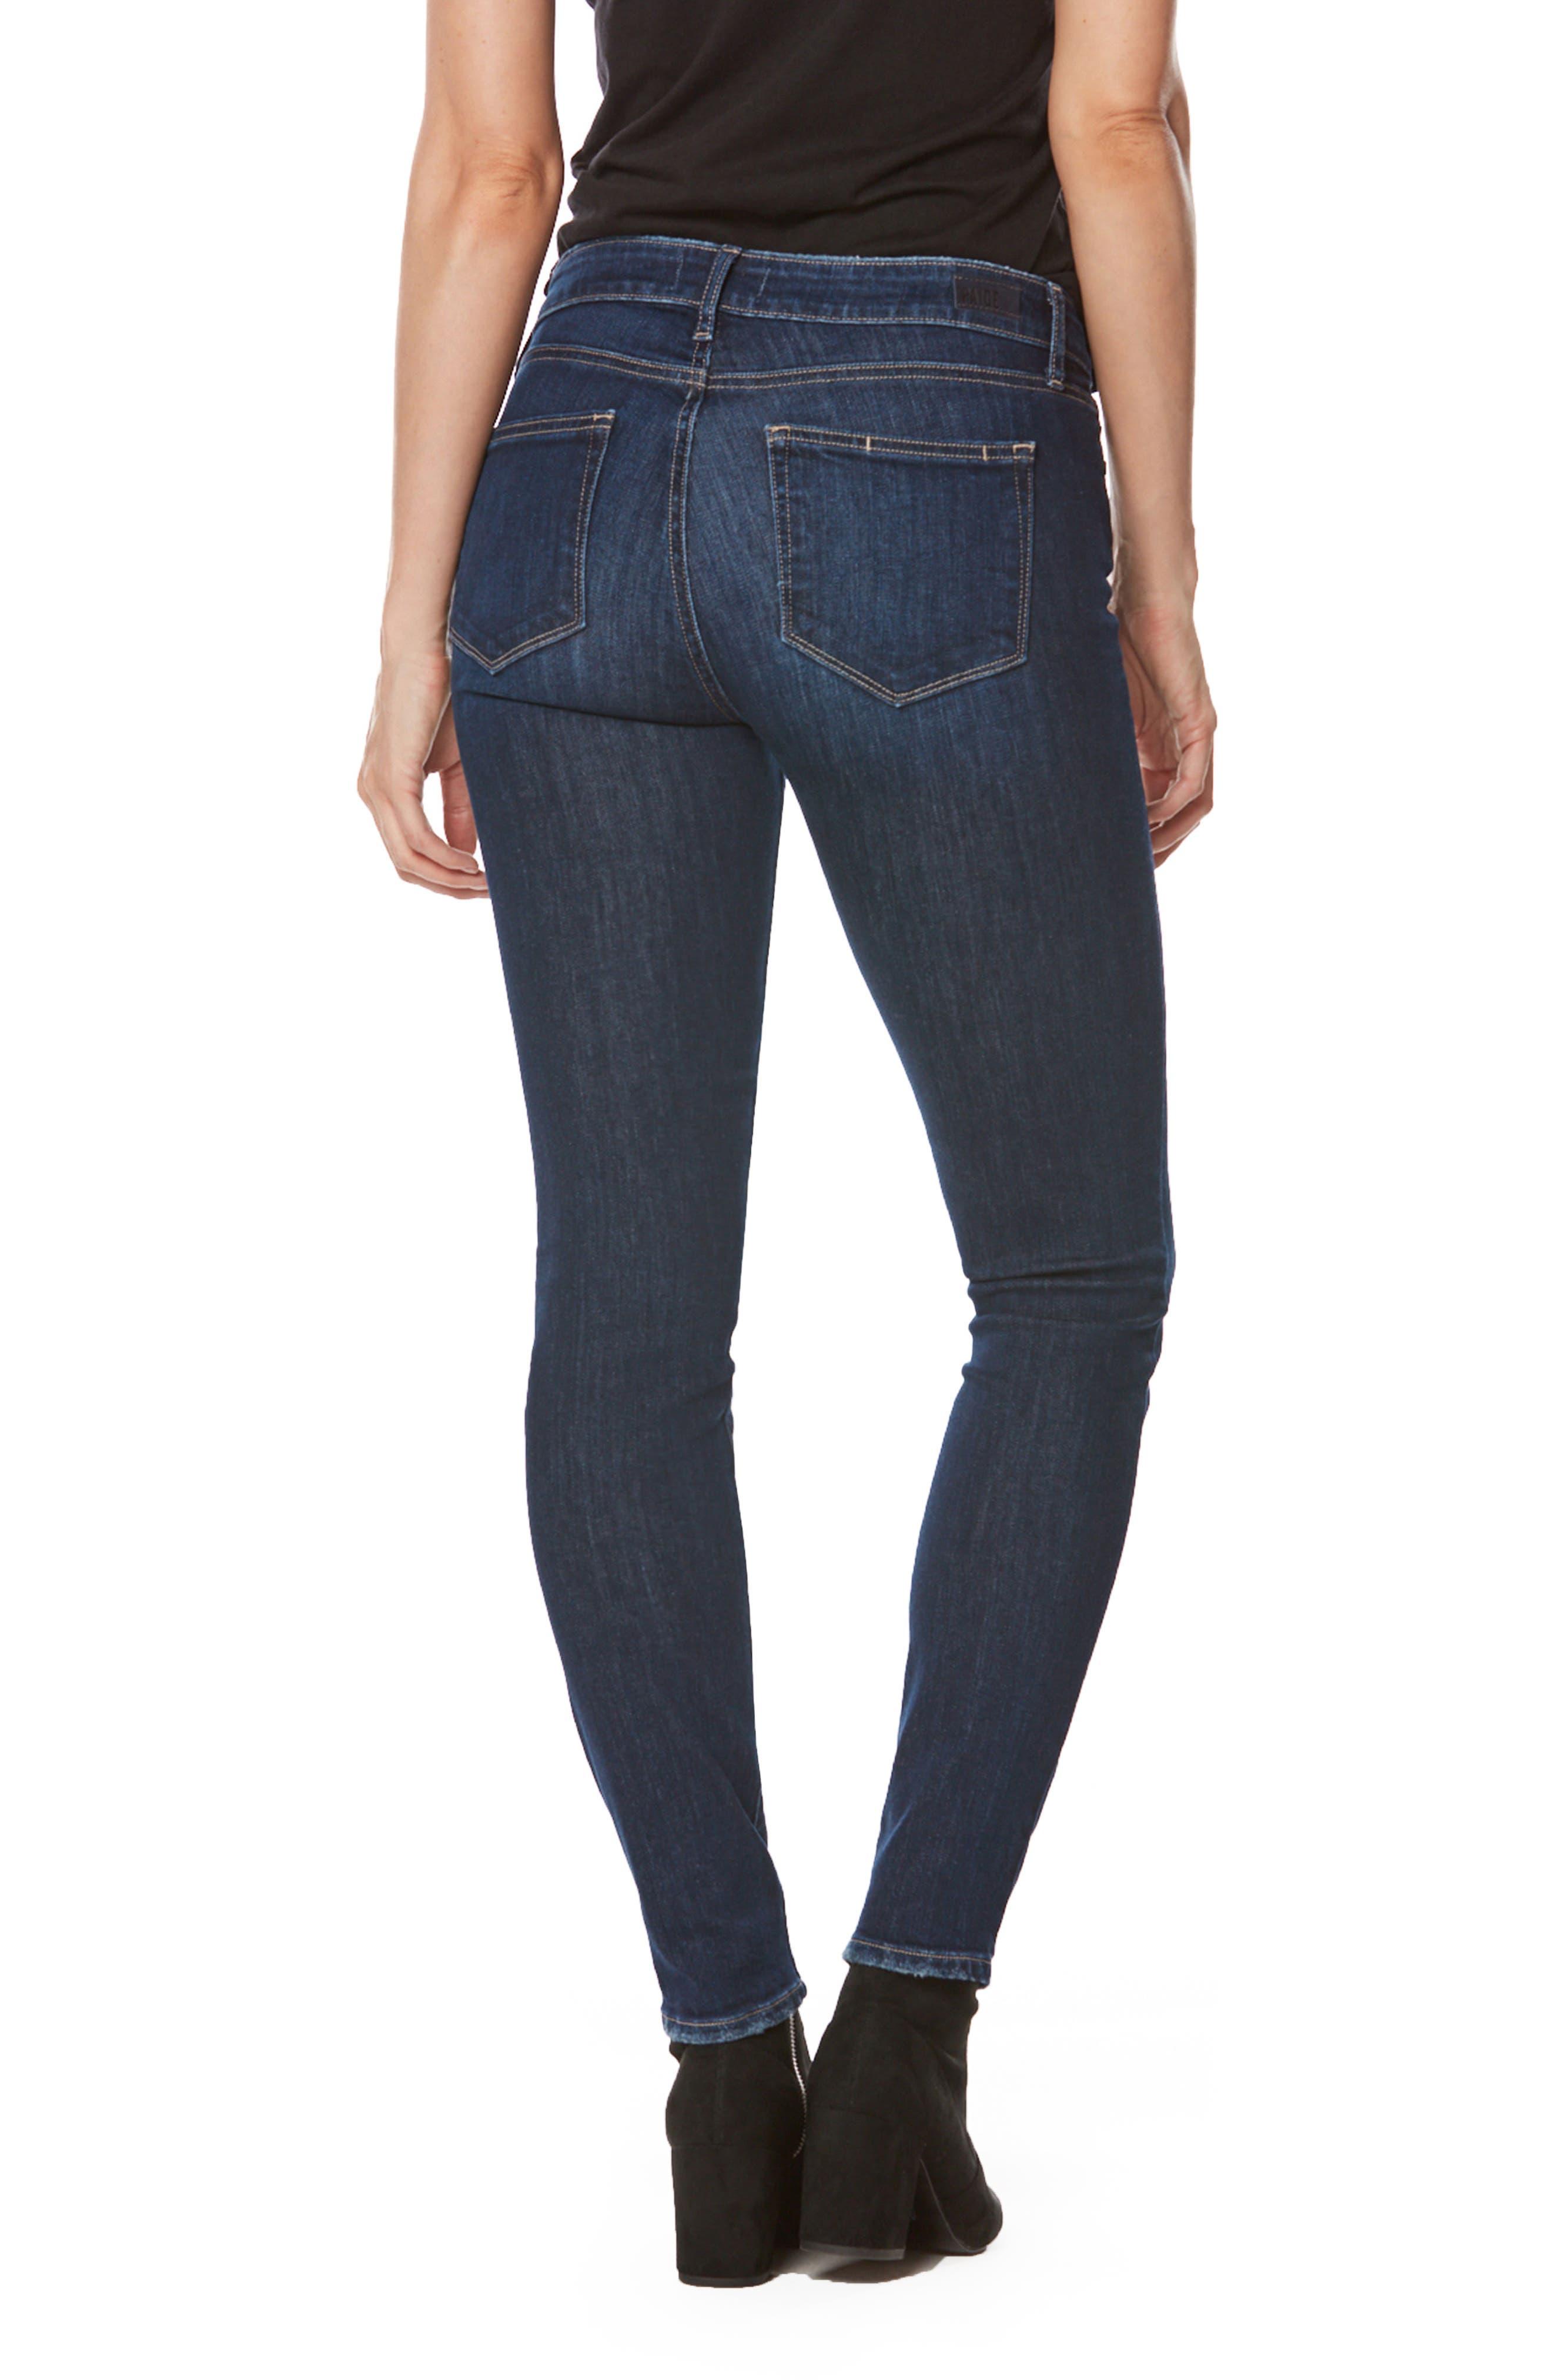 Transcend - Verdugo Ultra Skinny Jeans,                             Alternate thumbnail 3, color,                             Davidson Destructed